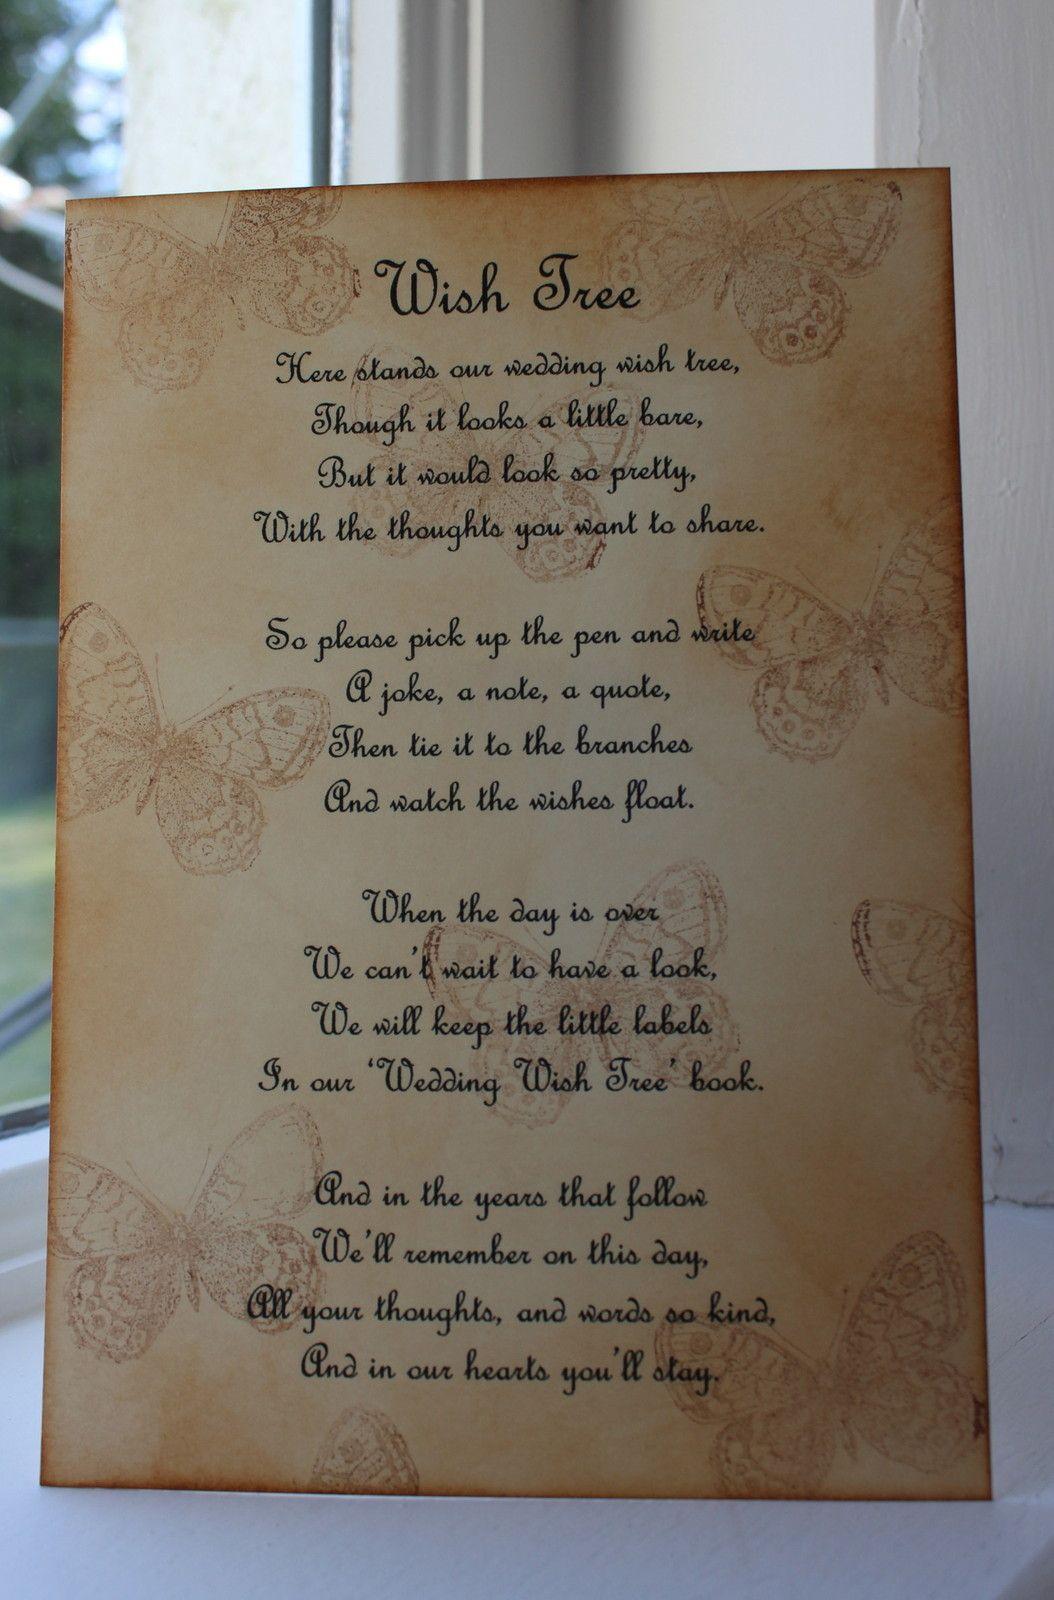 Butterfly Wedding Wish Tree Poem Vintage Style Beautiful Design